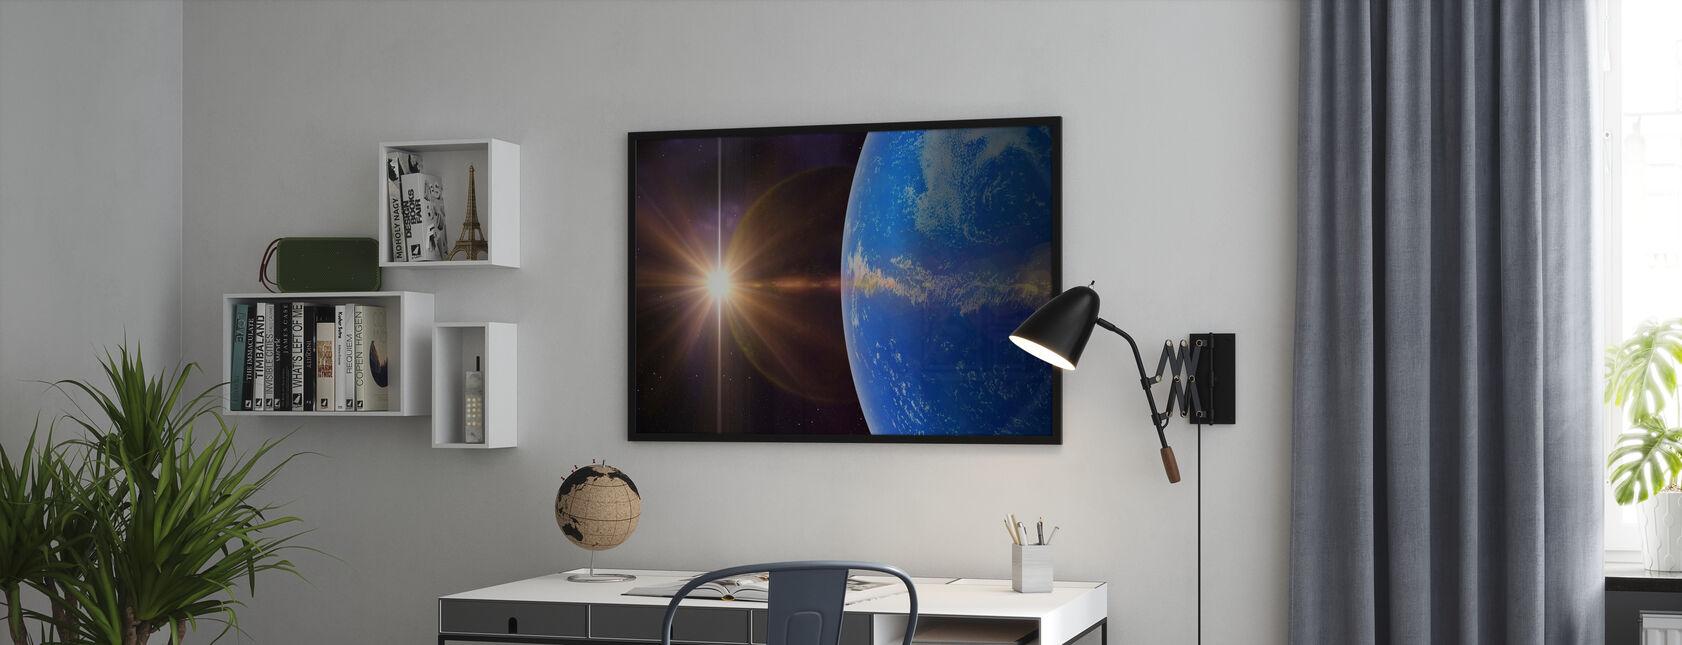 Blauer Planet - Gerahmtes bild - Büro